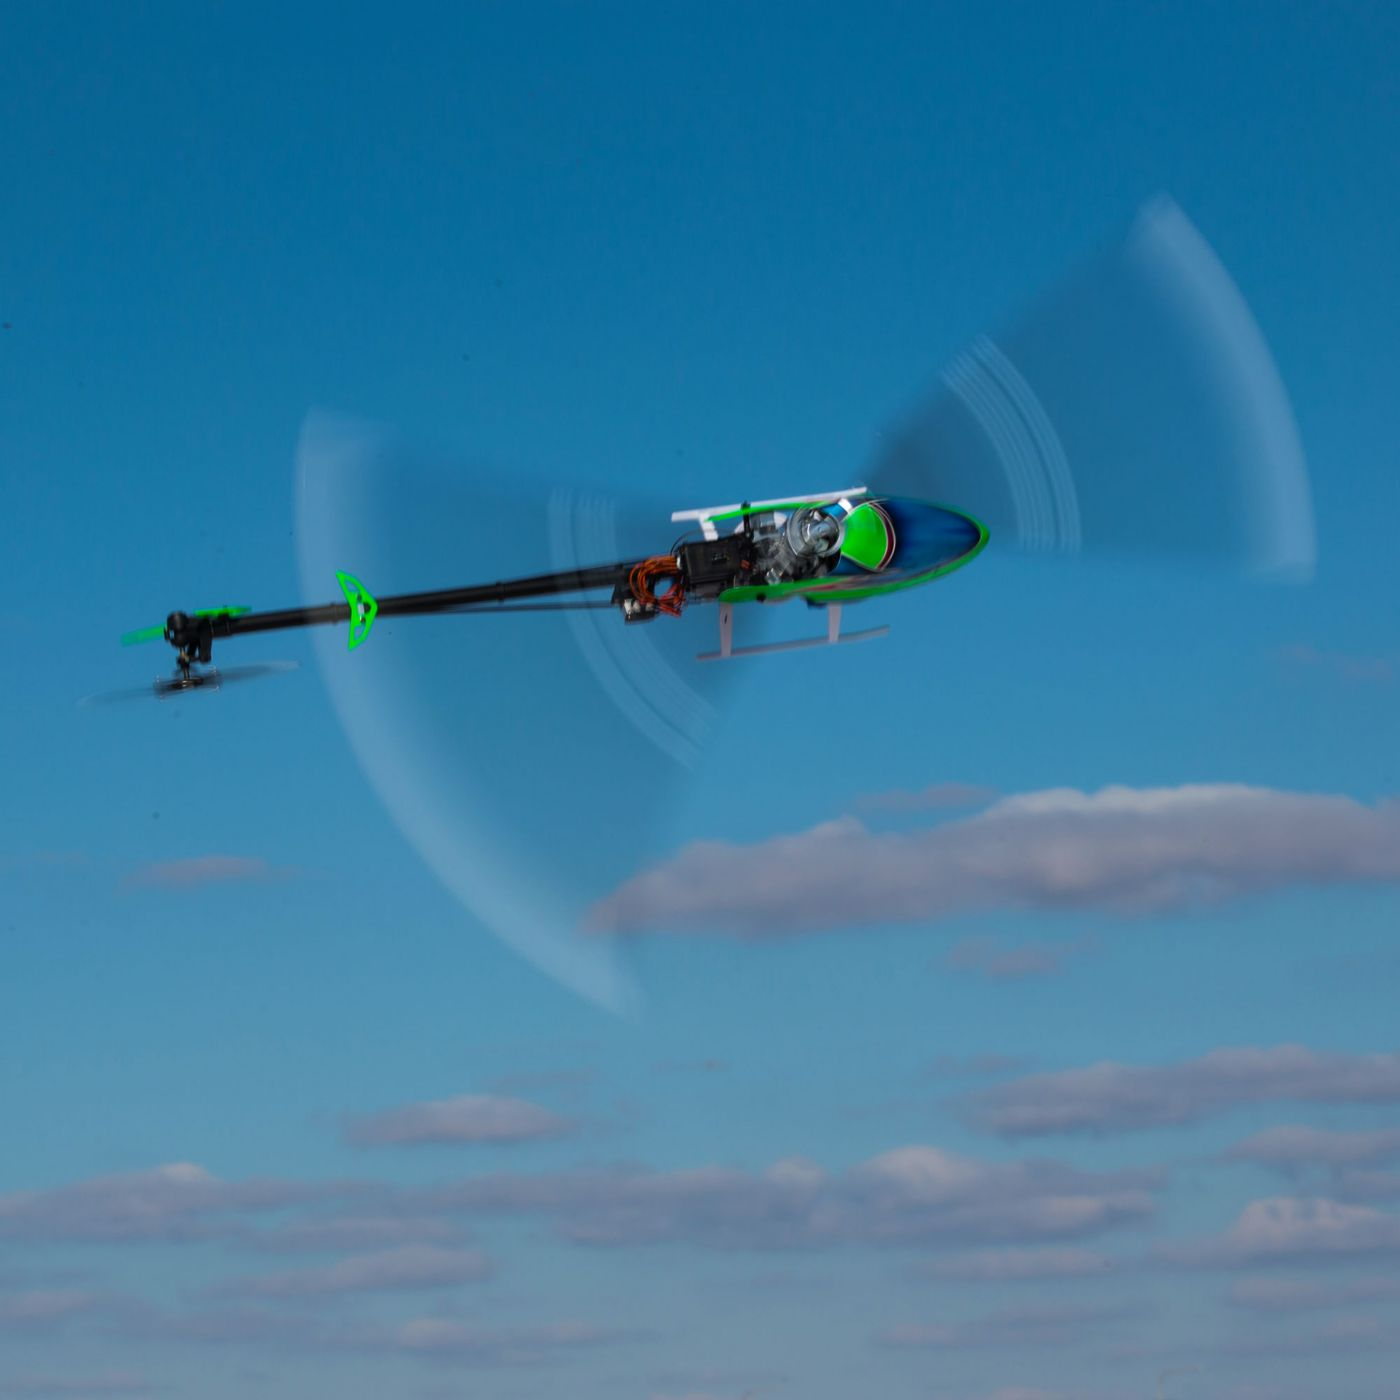 Blade 360 CFX 3S Elicottero rc bnf 3d 12